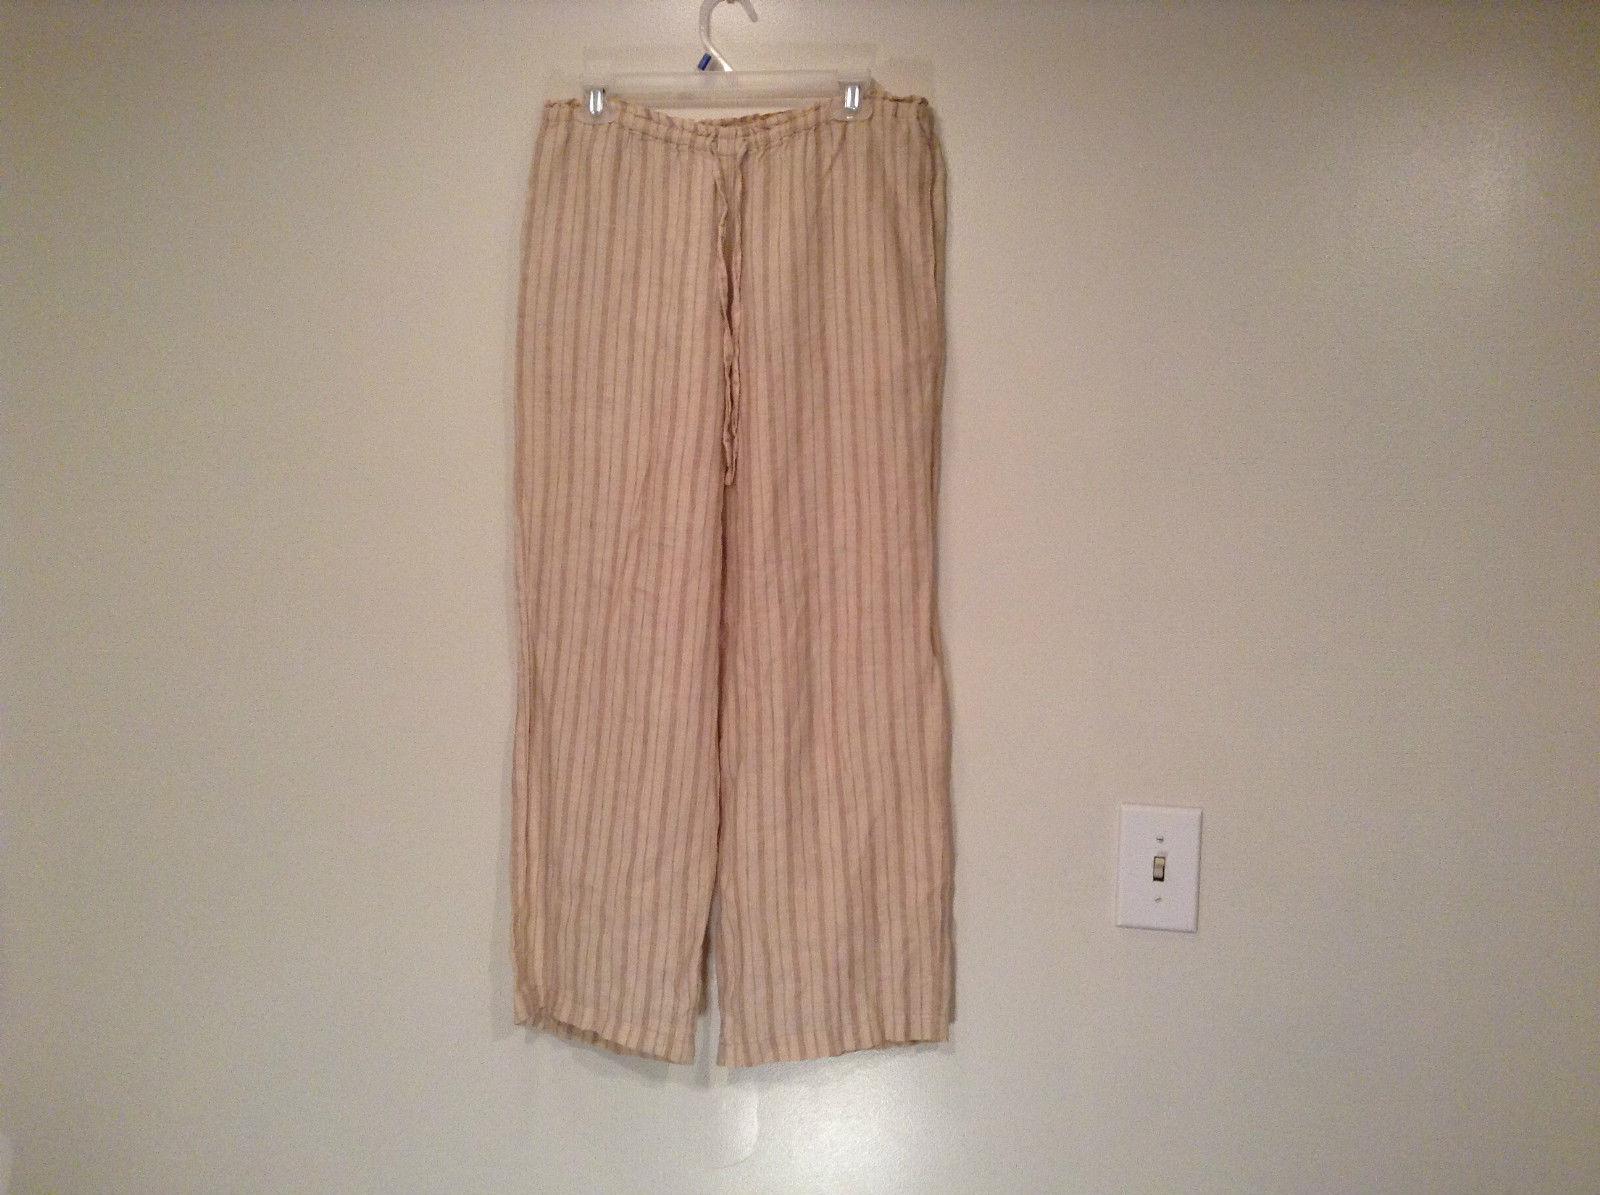 Light Brown Beige Casual Pants GAP Size S 100 Percent Linen Elastic Waist